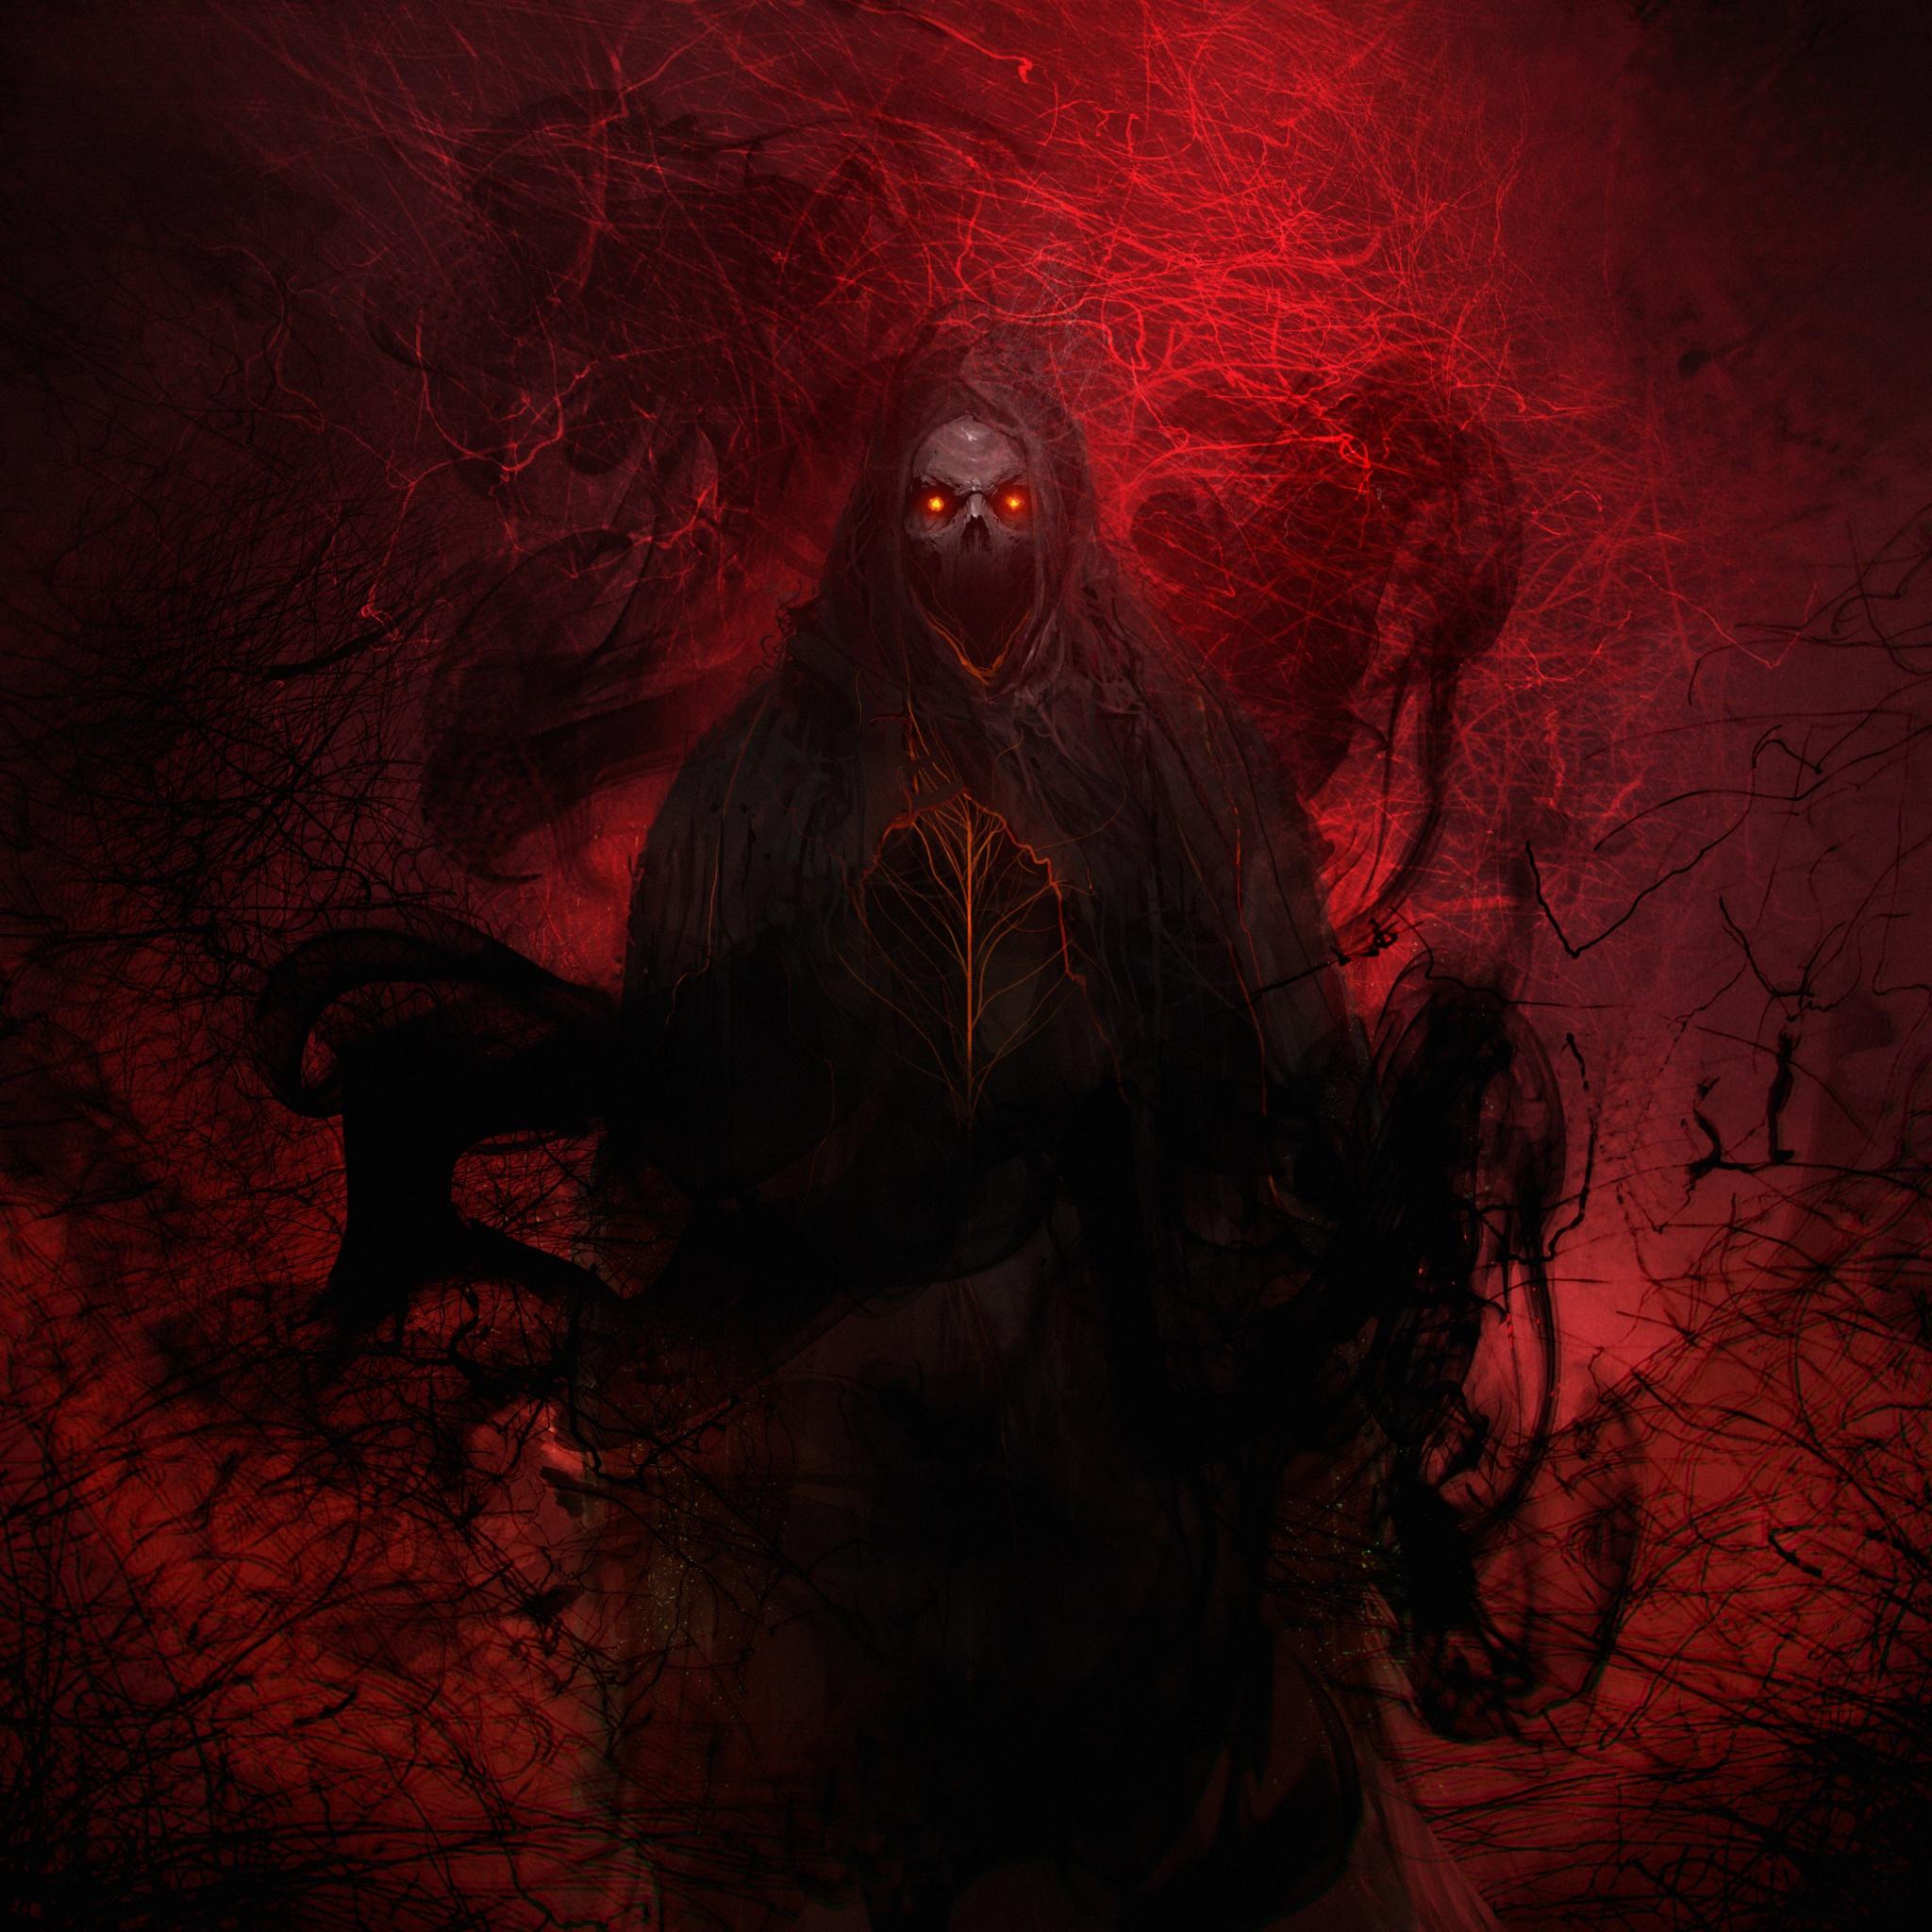 hell cgi graphics frightening 5k demon scary